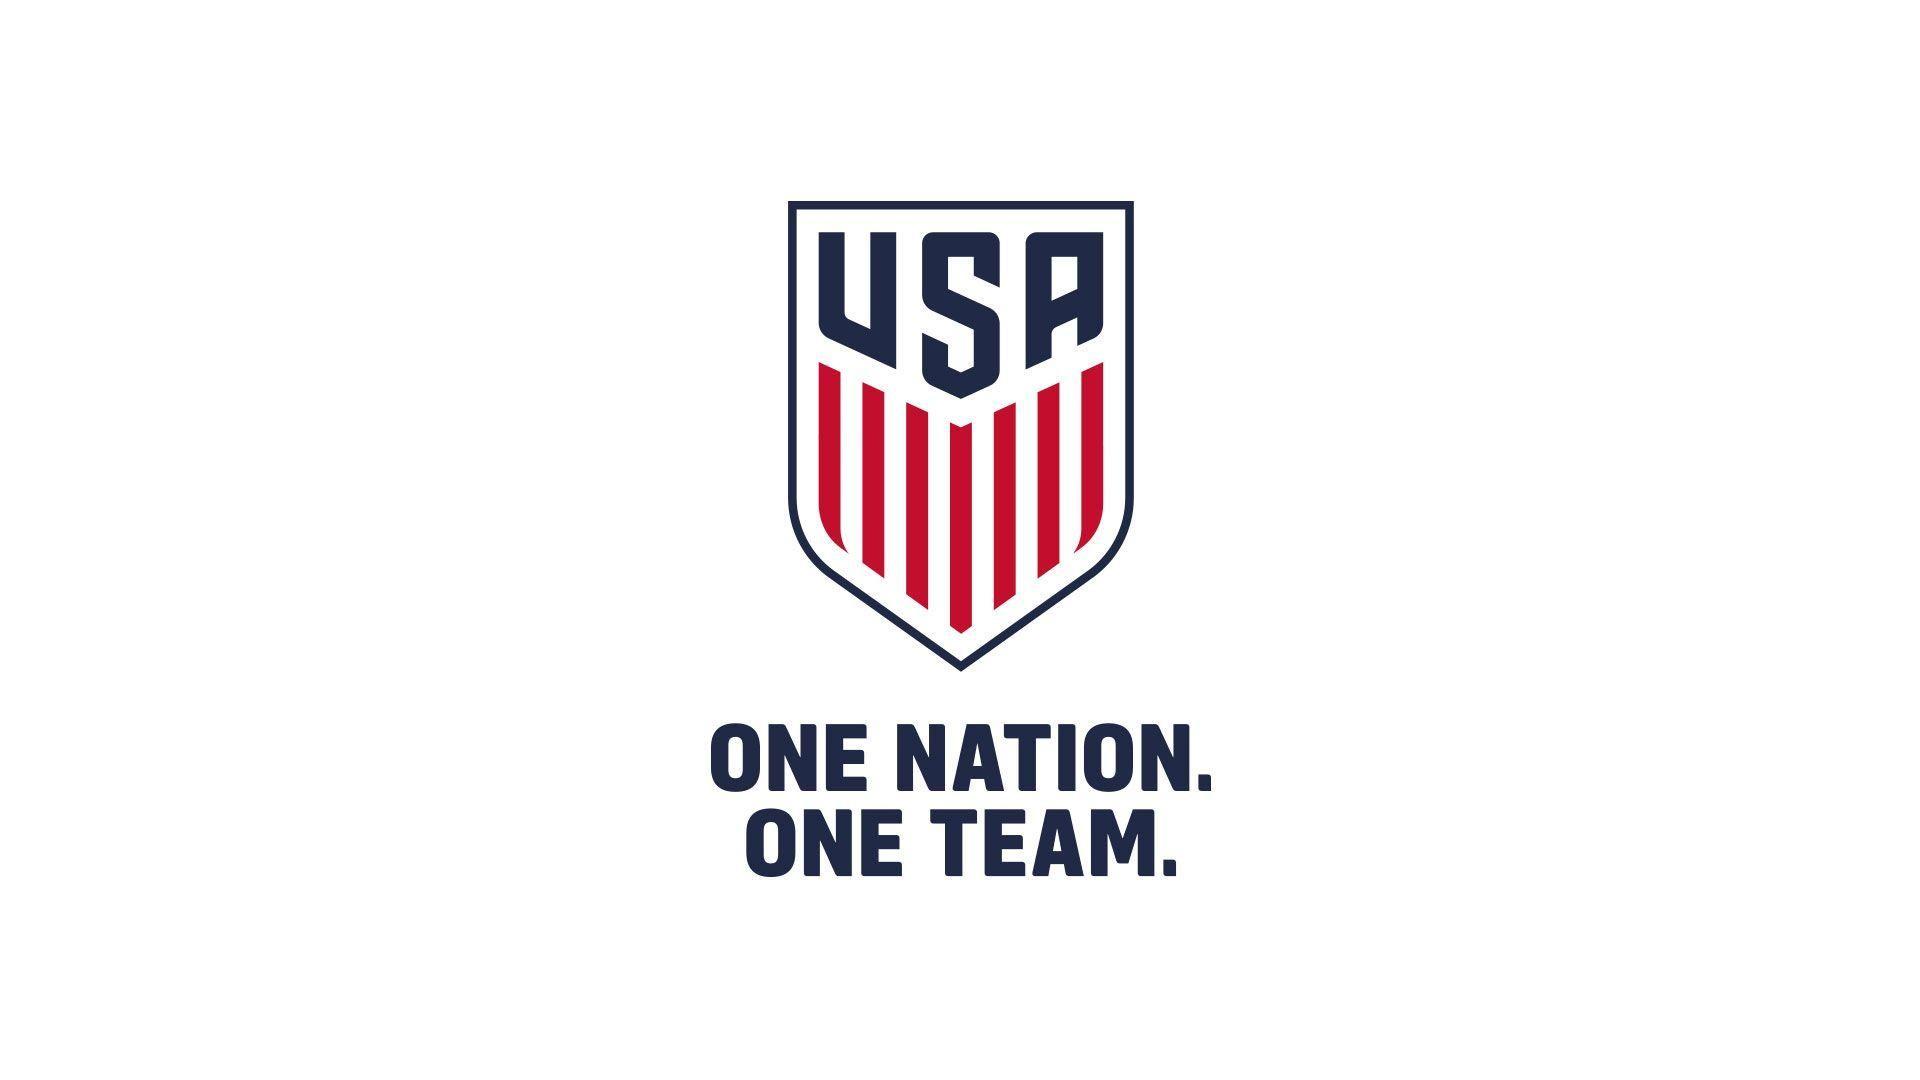 45 U S Soccer Wallpapers Download At Wallpaperbro Team Wallpaper Usa Soccer Usa Soccer Team